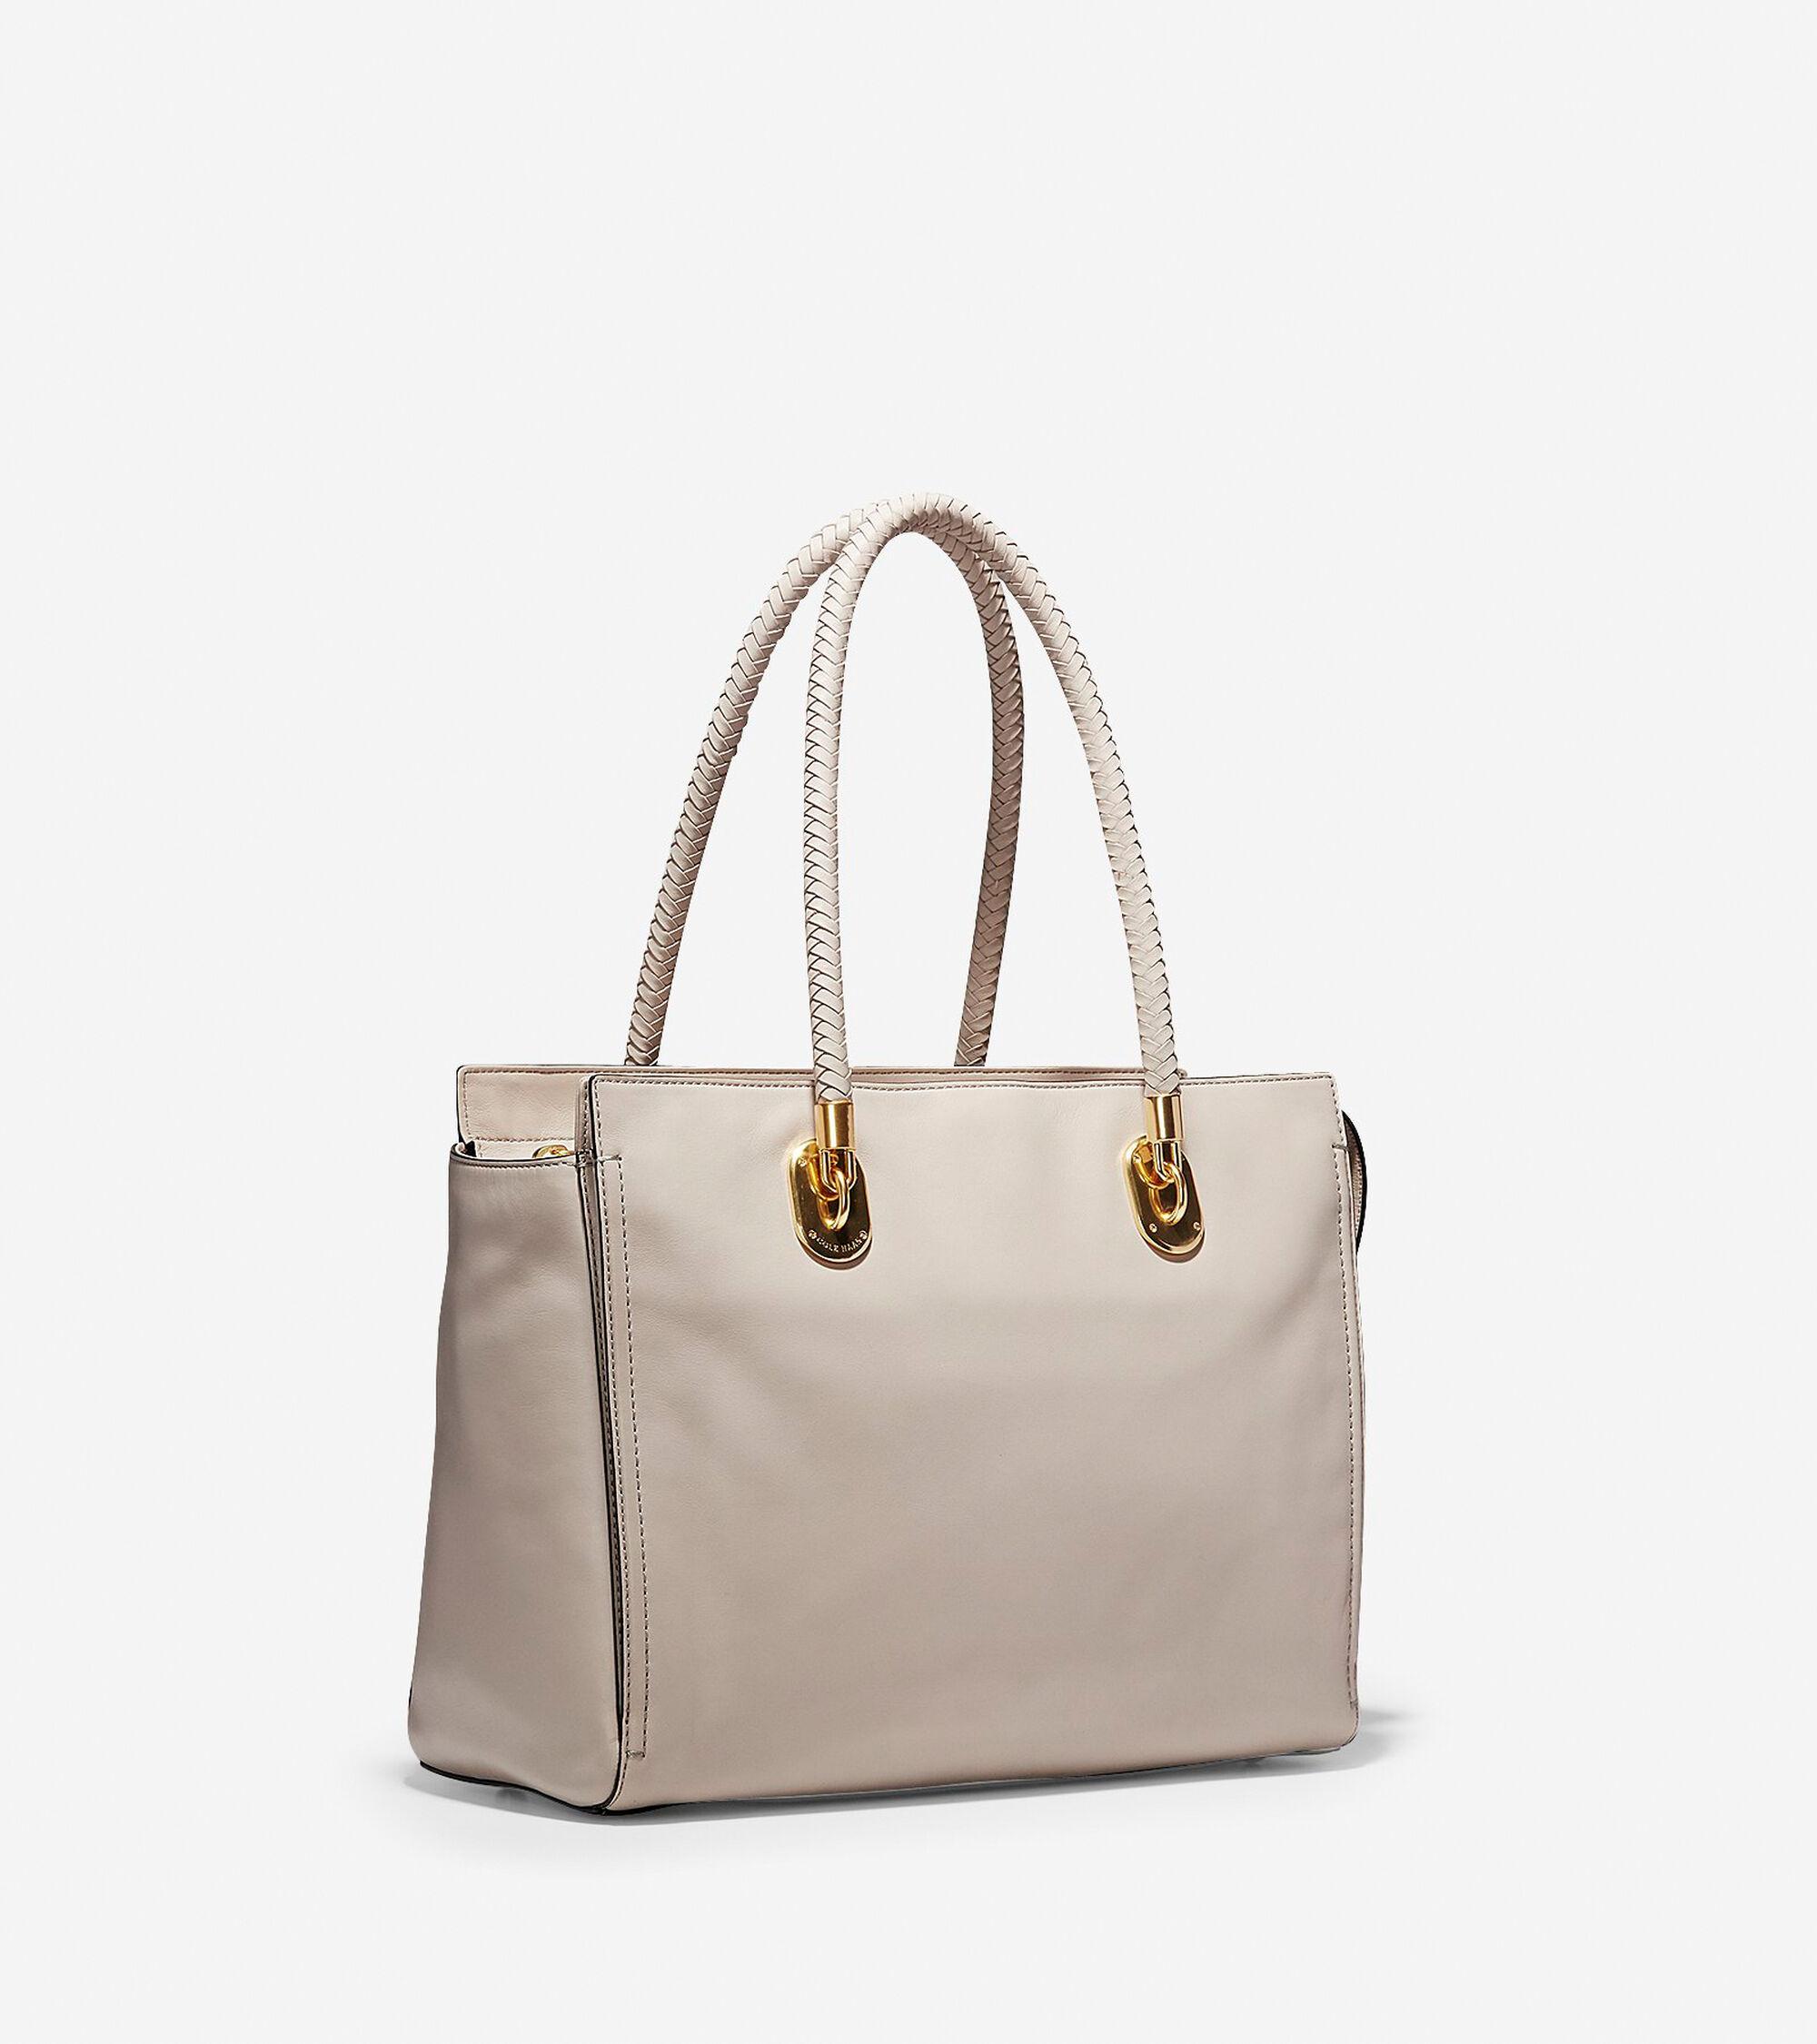 98aa28275c6d Women s Benson Work Tote in Dove Leather